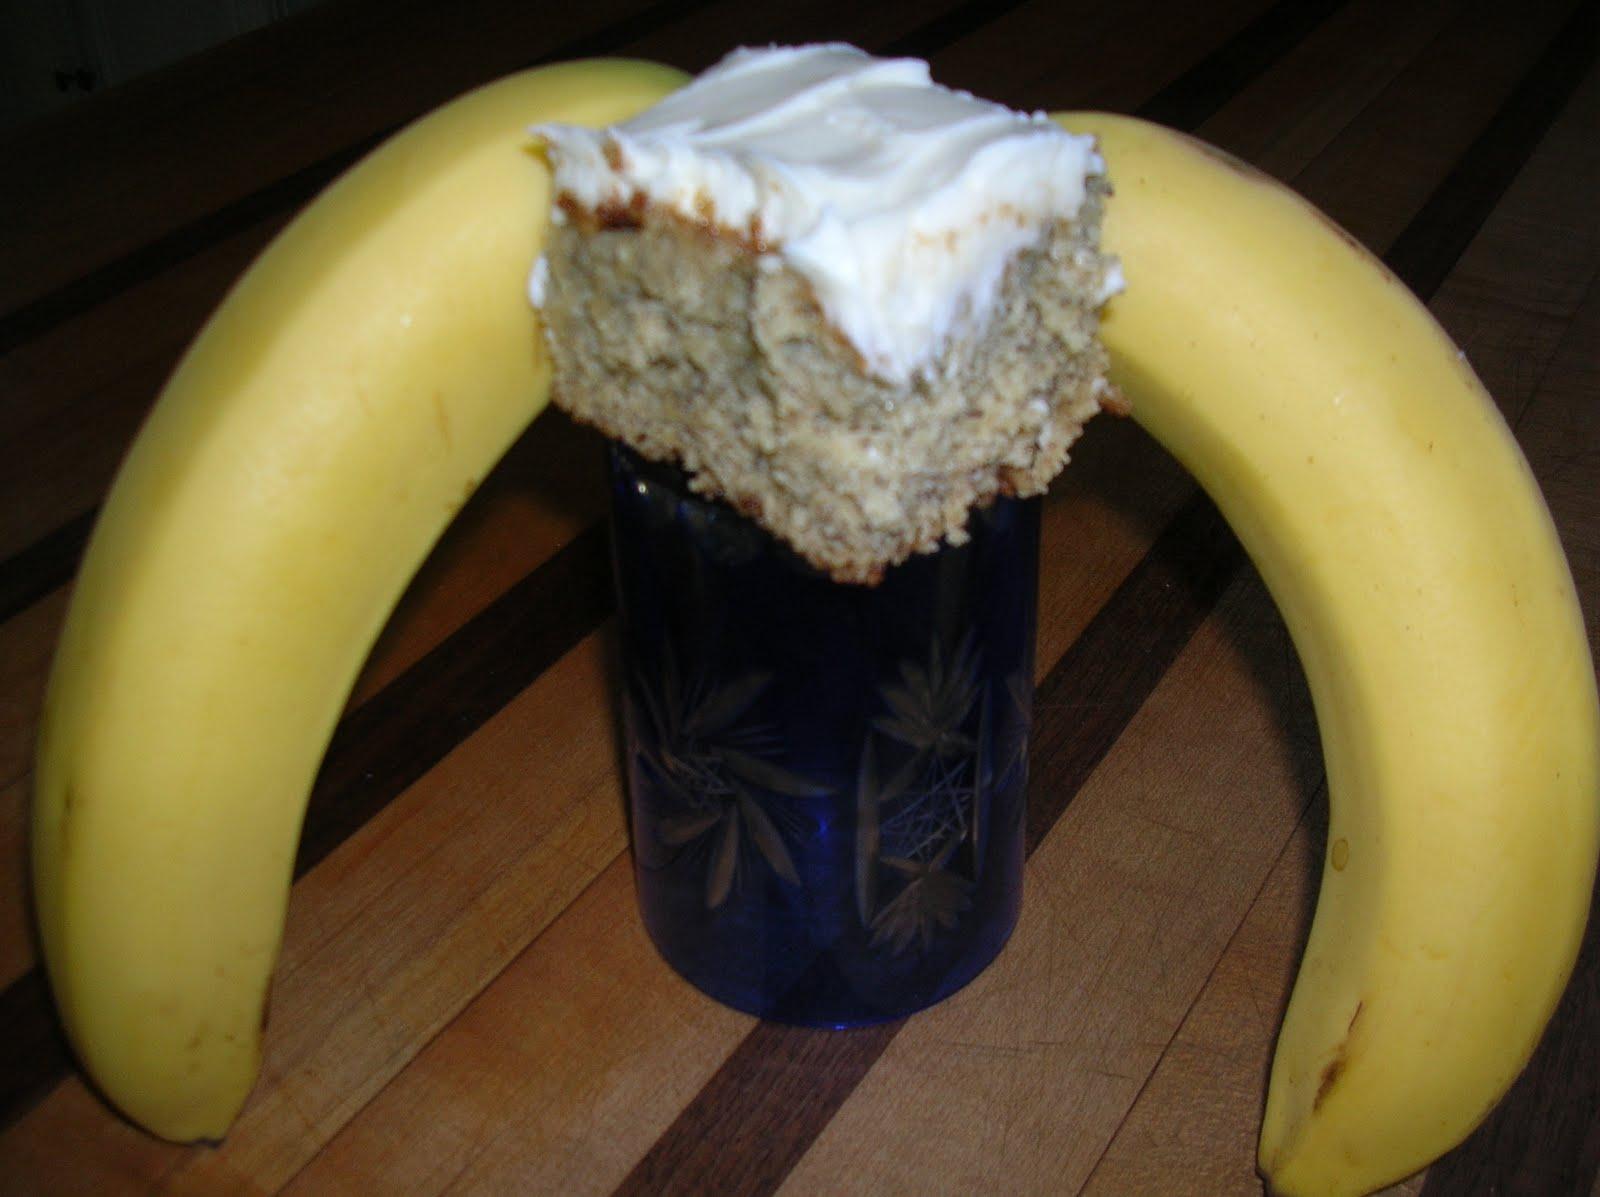 http://3.bp.blogspot.com/_0fSDaRp2e4A/S-yNtex7v7I/AAAAAAAAAWk/pFNMUwRaEtI/s1600/Frosted%2BBanana%2BBars%2B001.jpg